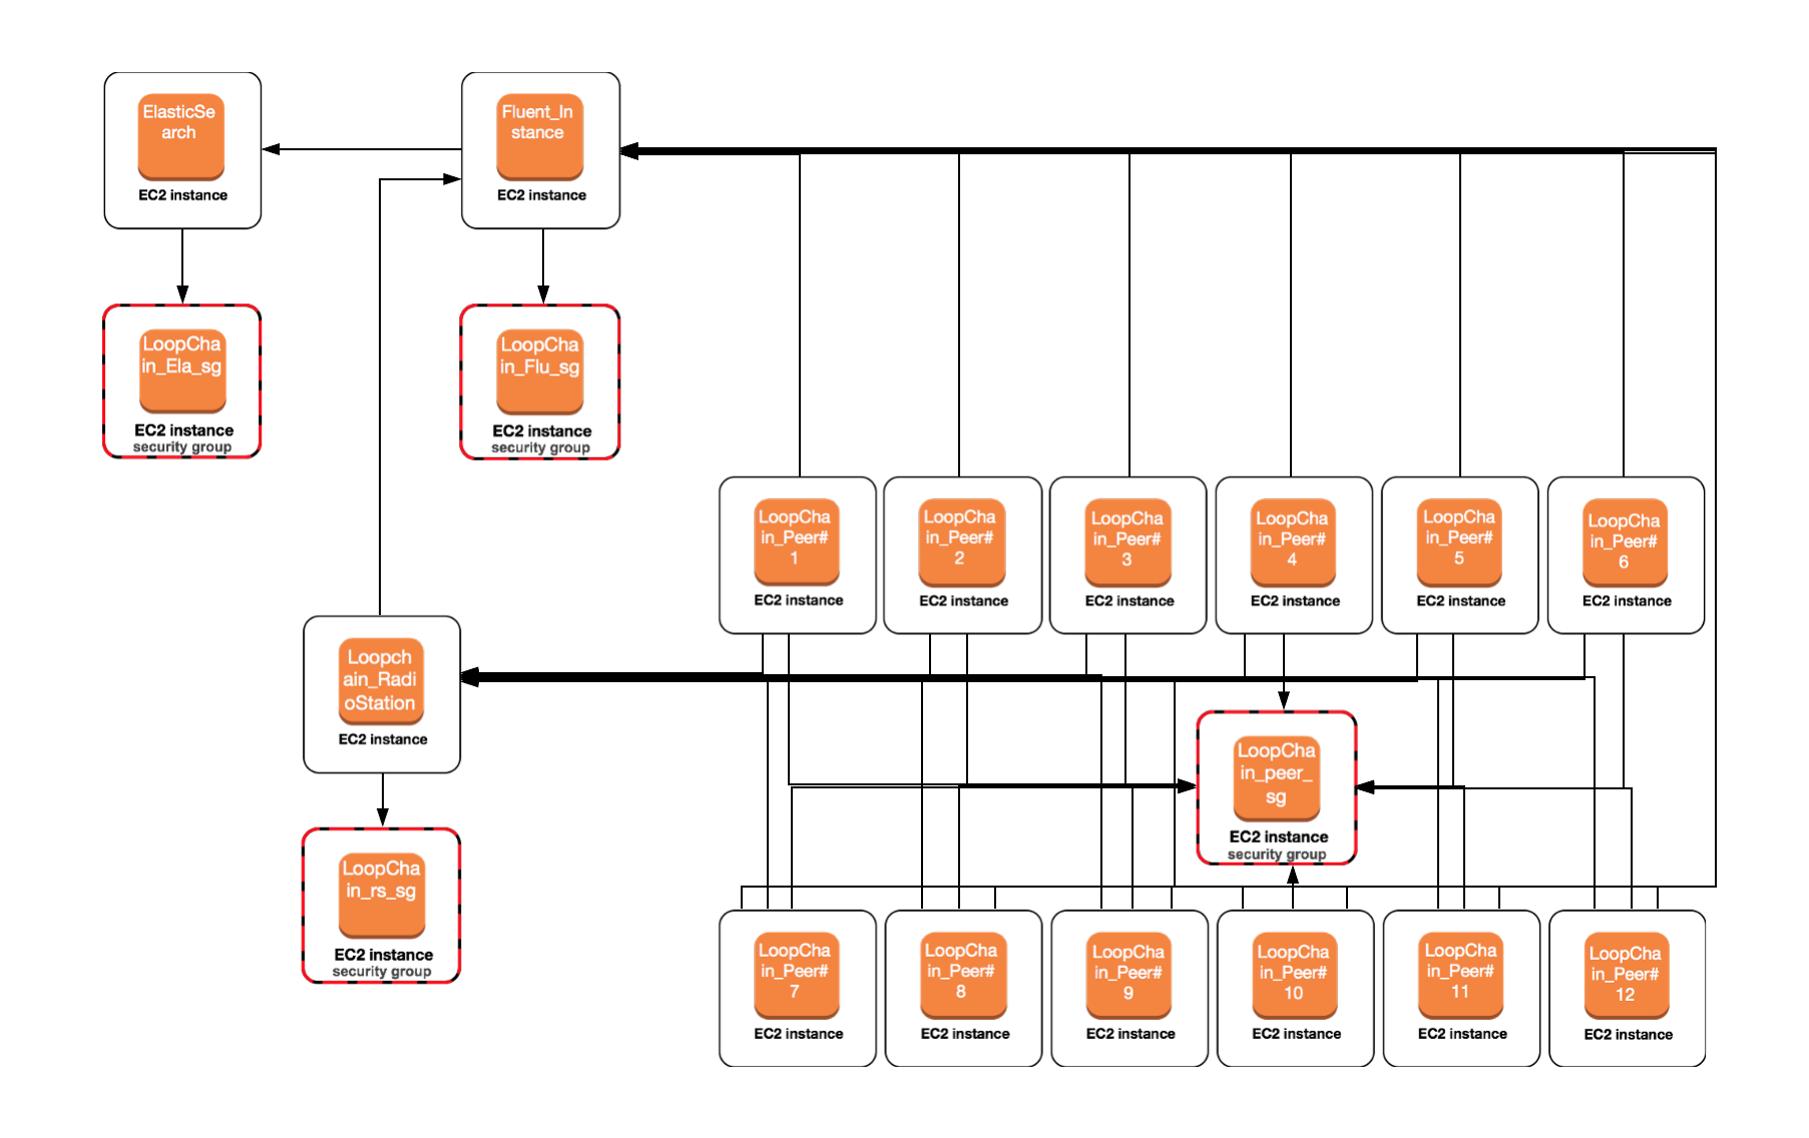 AWS Marketplace: ICON Development Network